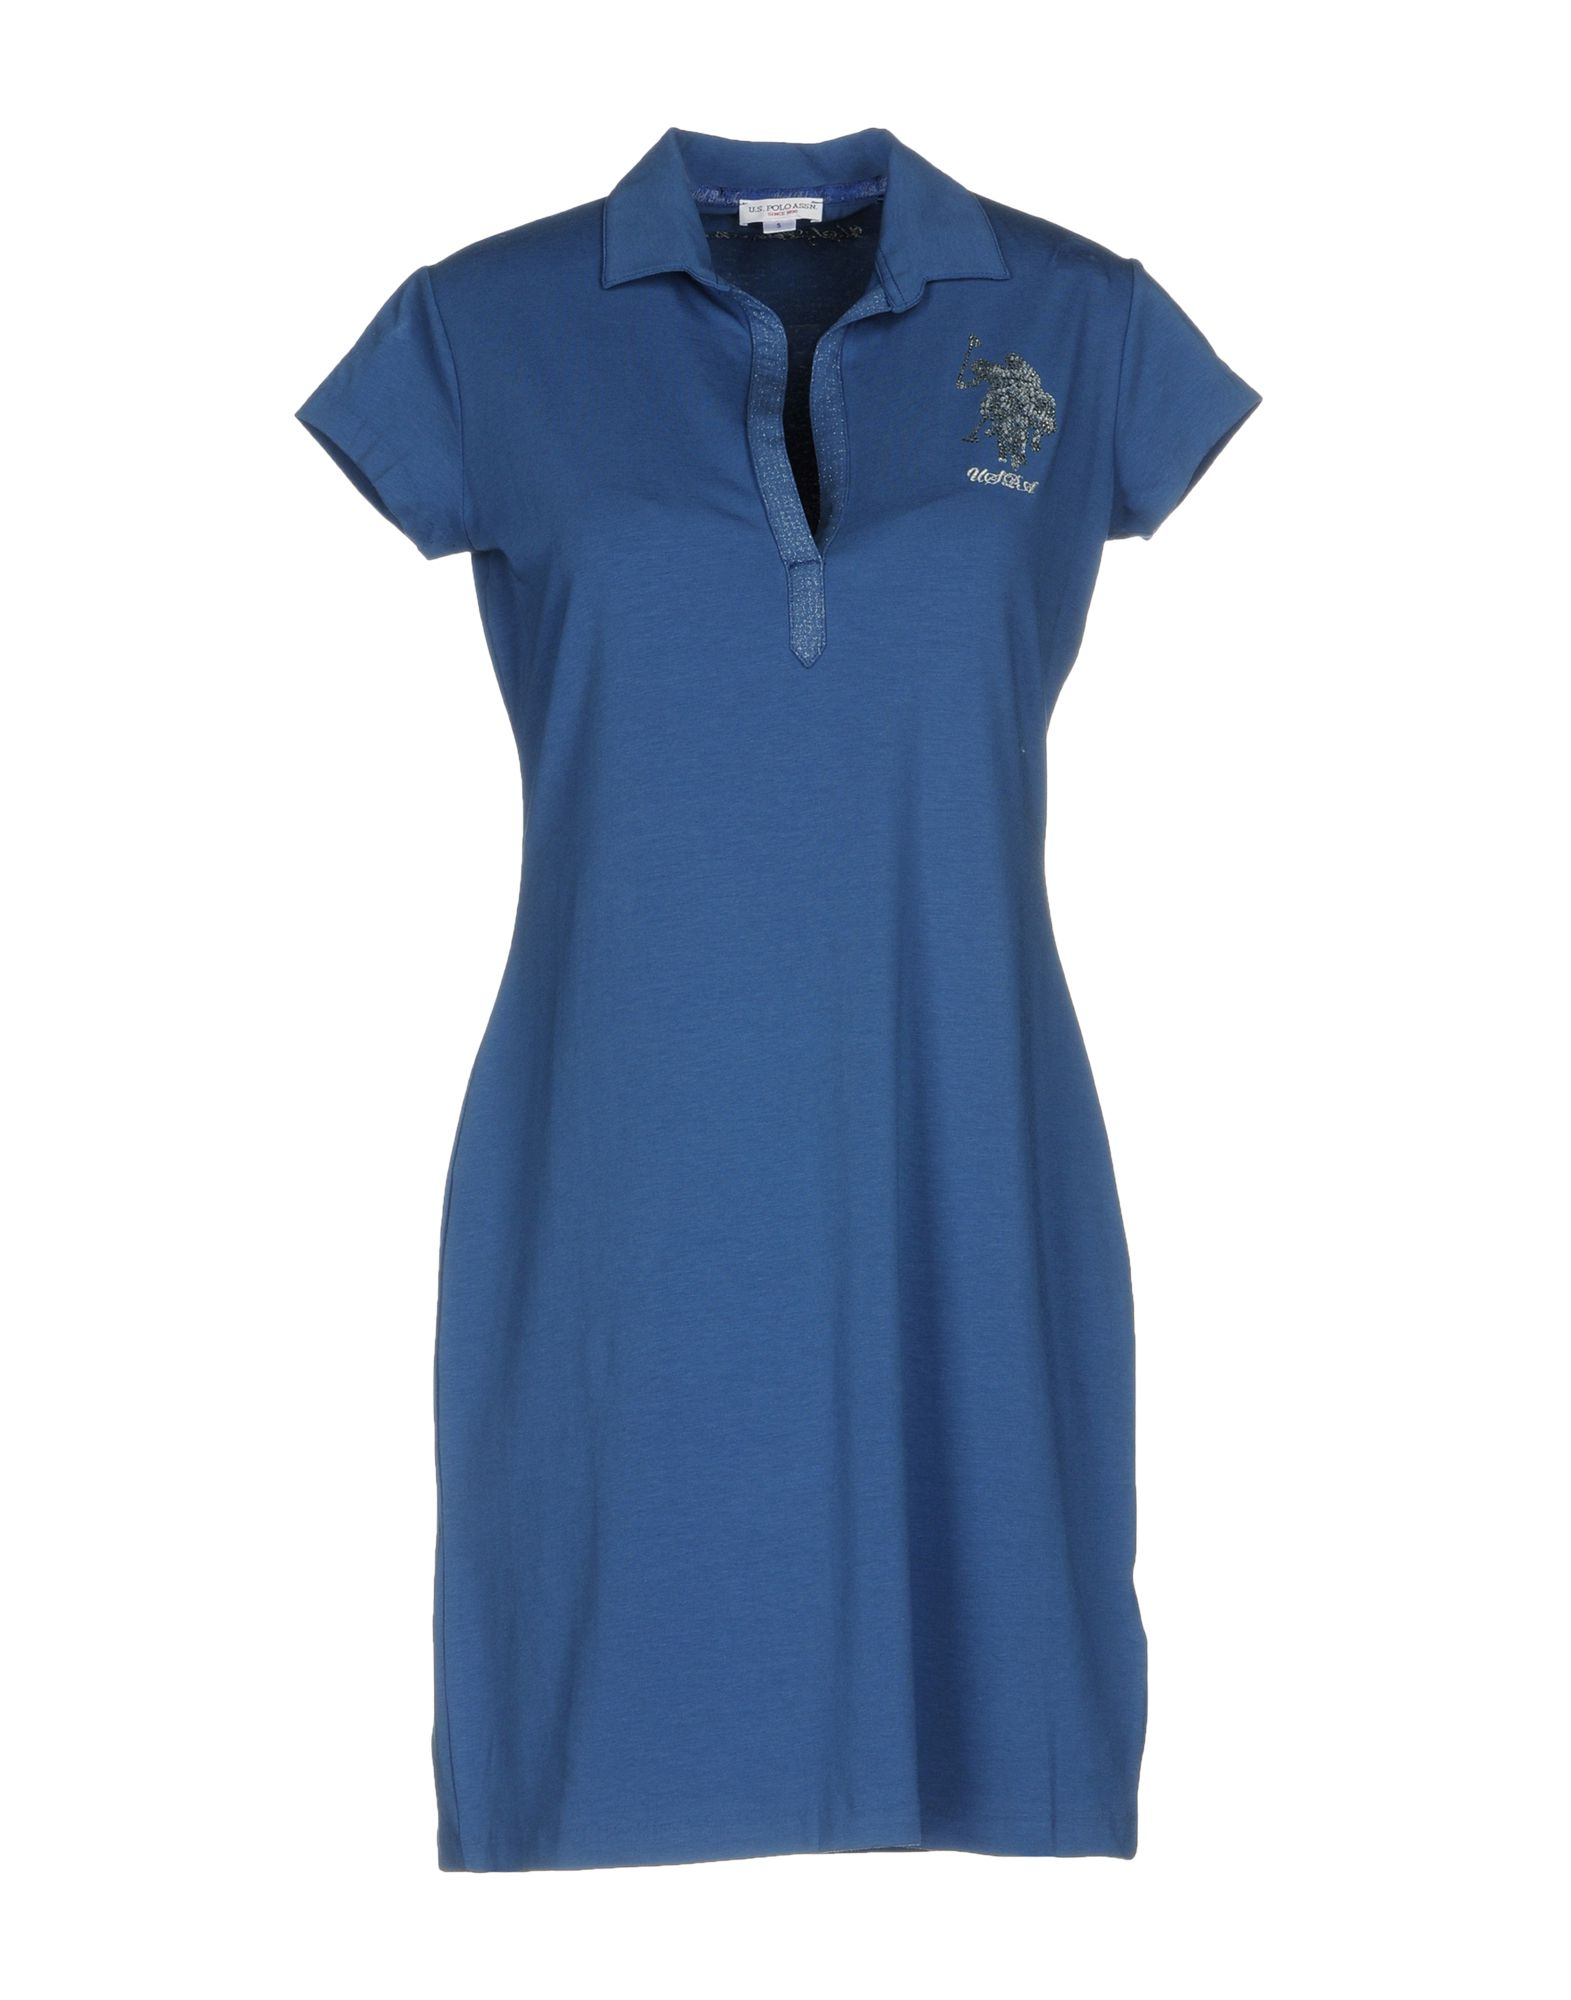 U.S.POLO ASSN. Damen Kurzes Kleid Farbe Blaugrau Größe 5